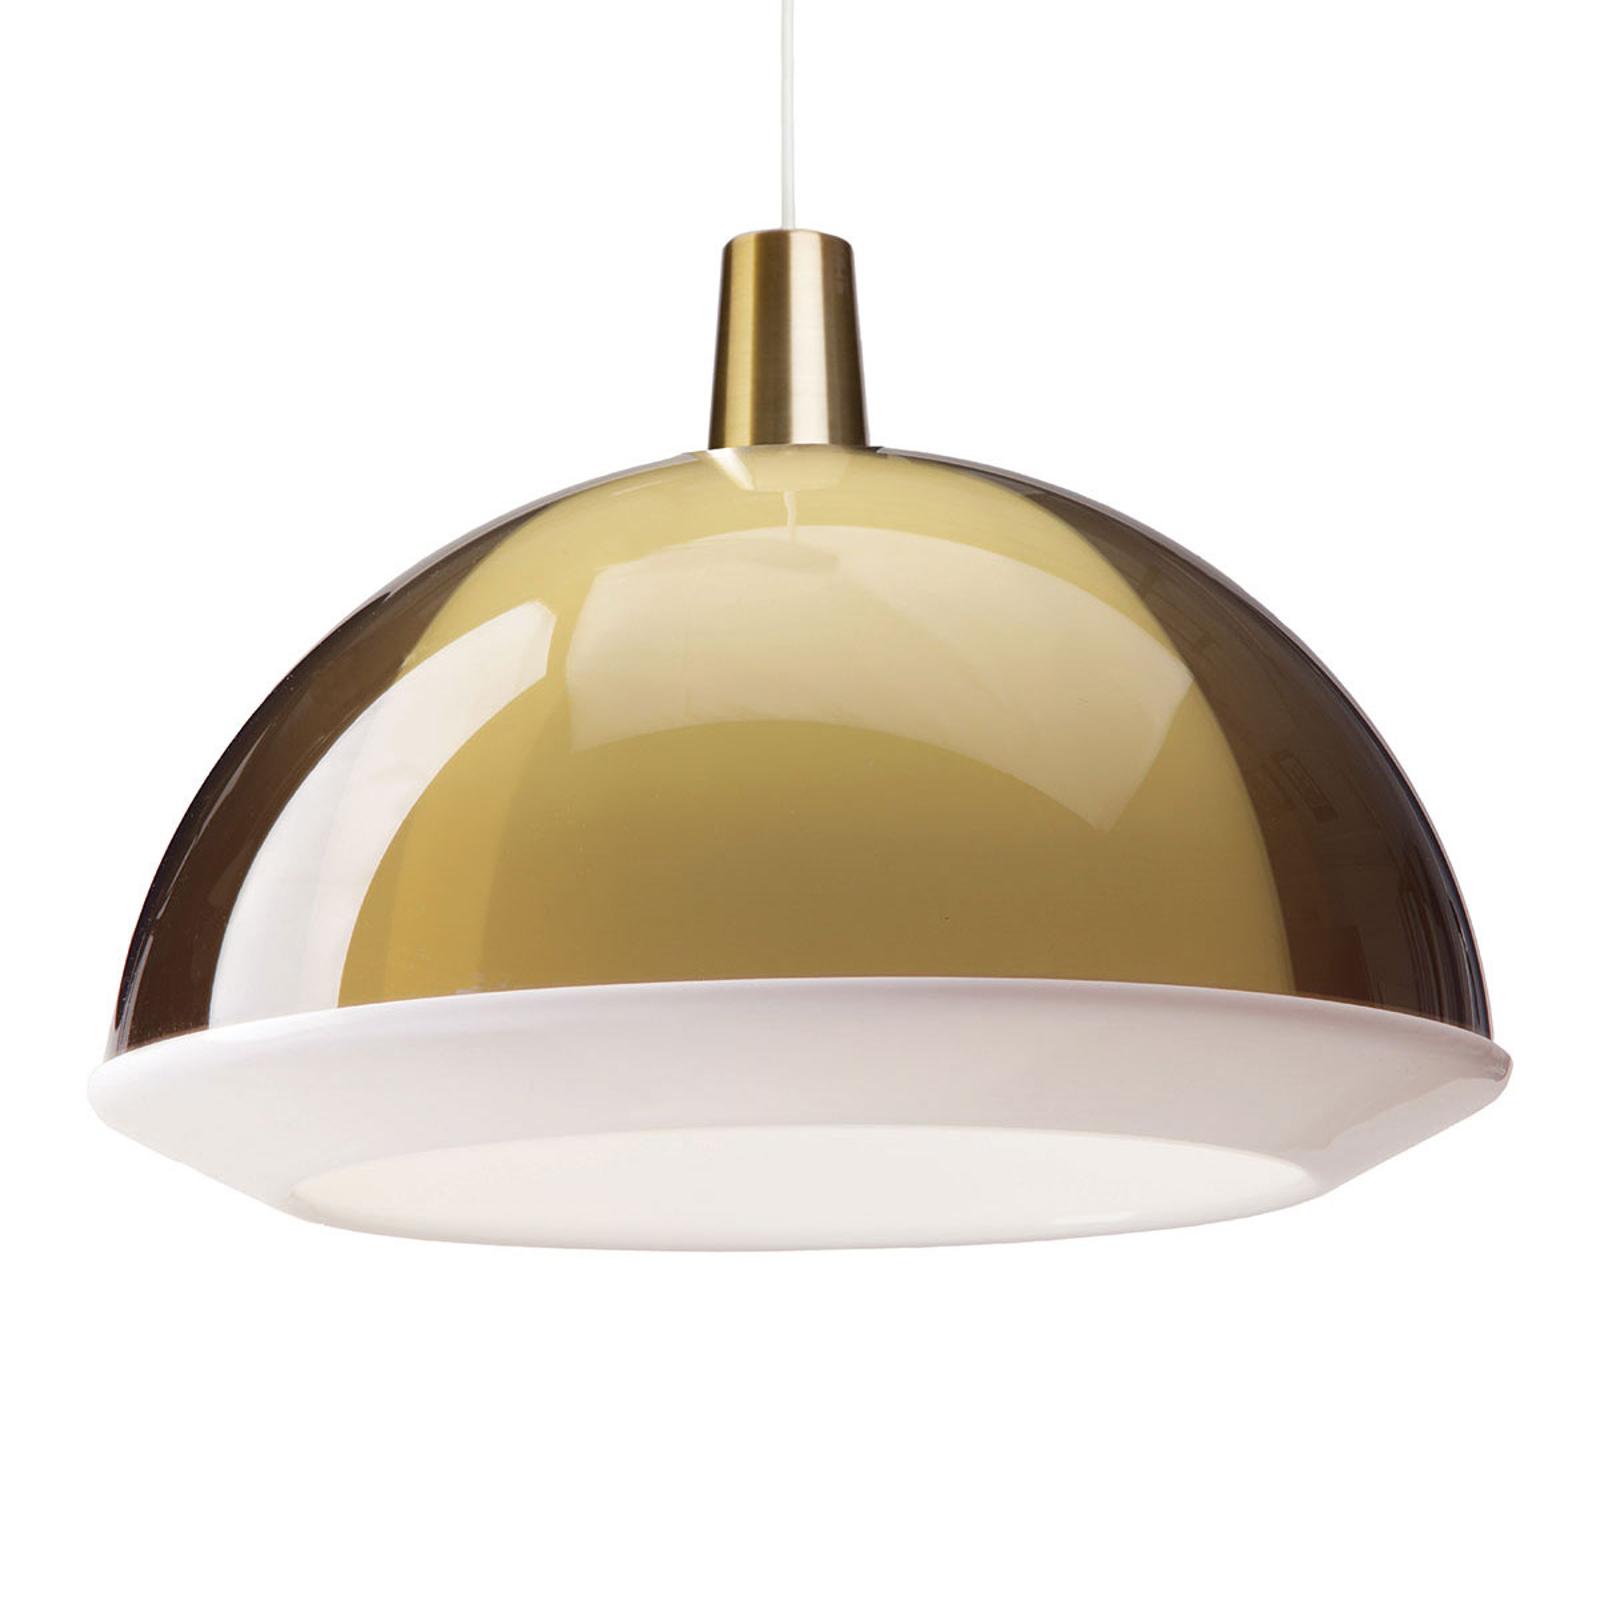 Innolux Kuplat 480 hanglamp 48 cm zand